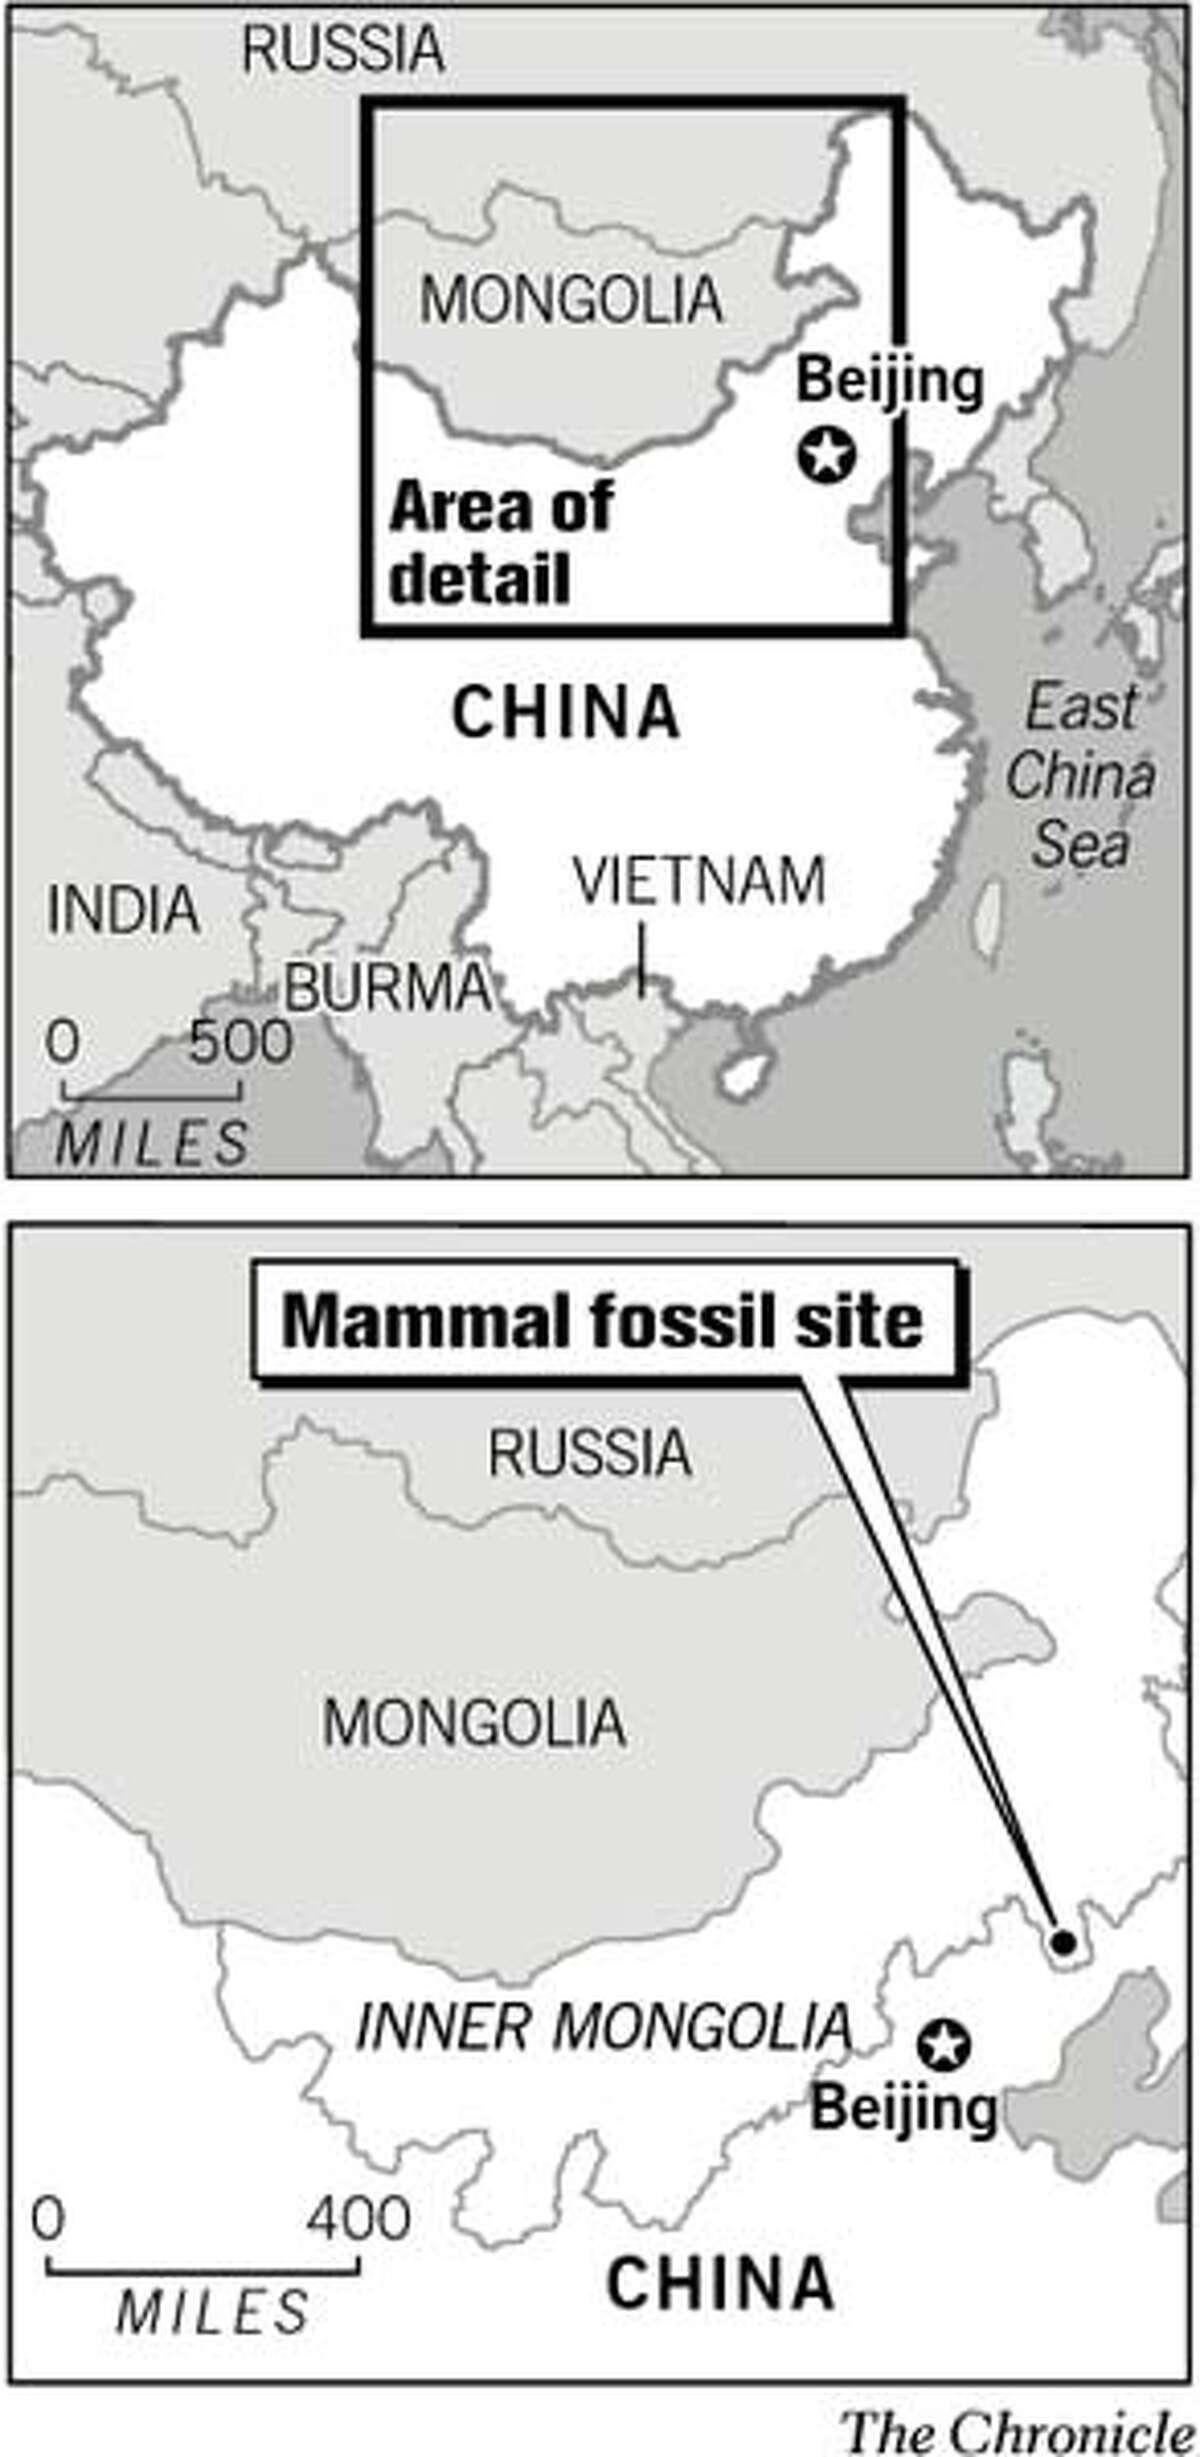 (A2) Mammal fossil site